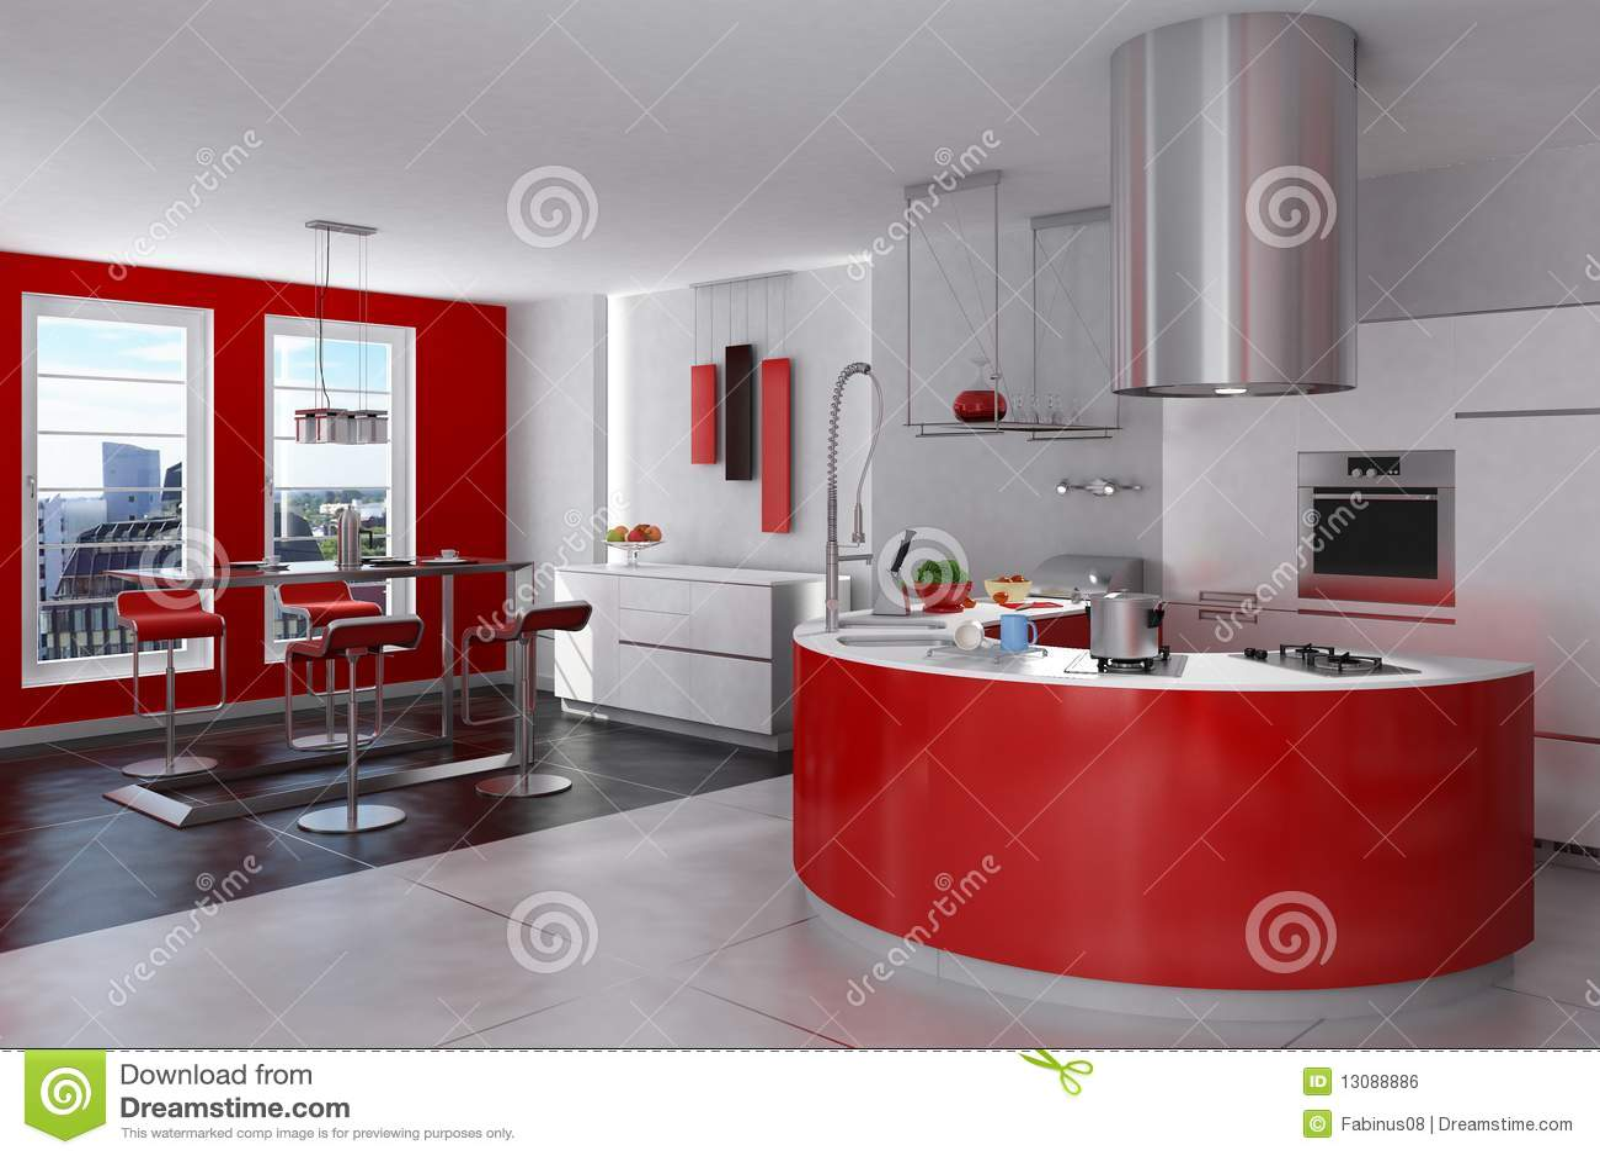 Cucine shabby chic torinocucine shabby chic usate : cucine cesar ...